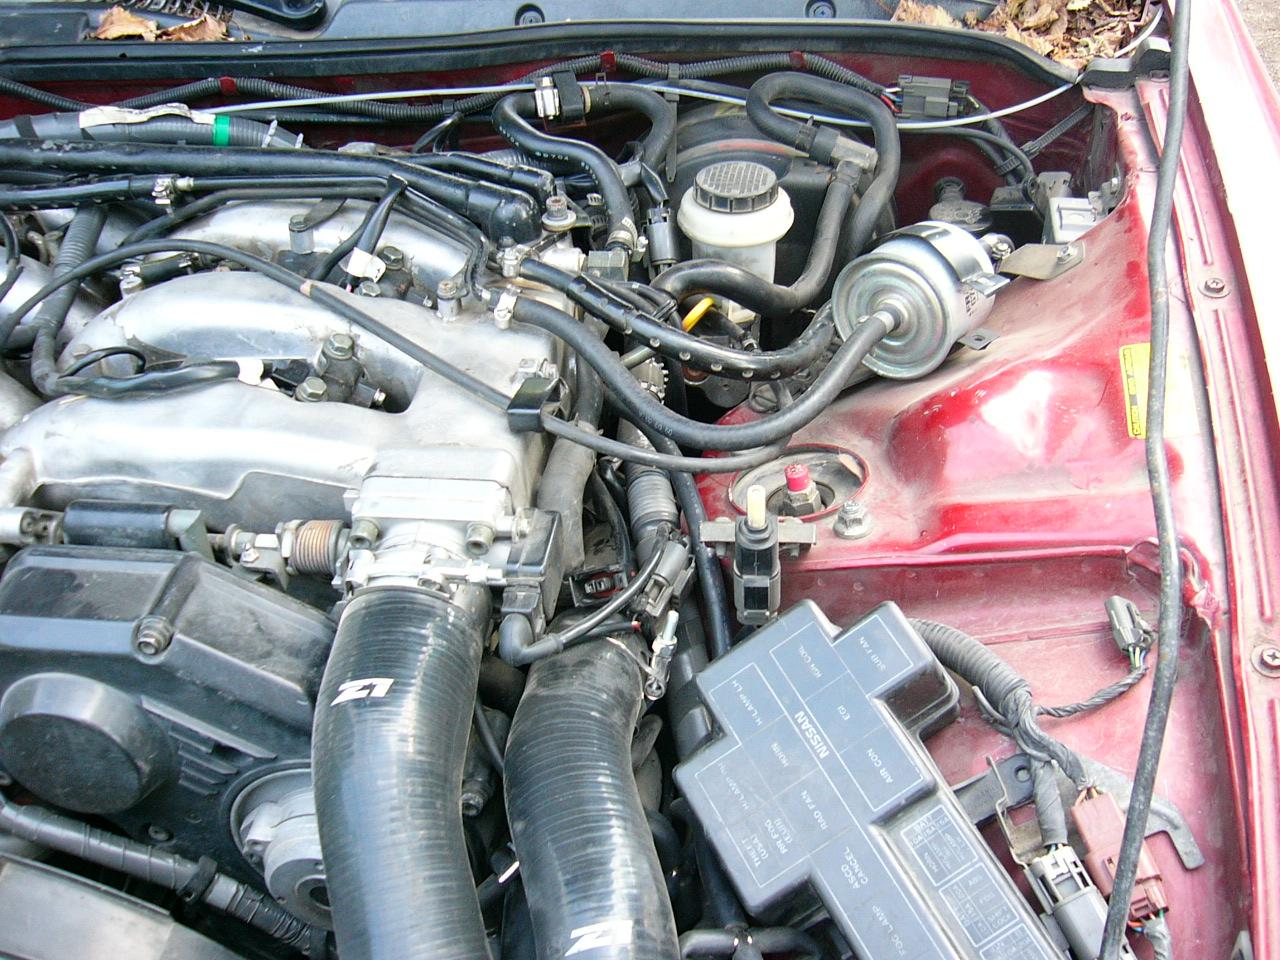 300zx tt engine best car insurances. Black Bedroom Furniture Sets. Home Design Ideas